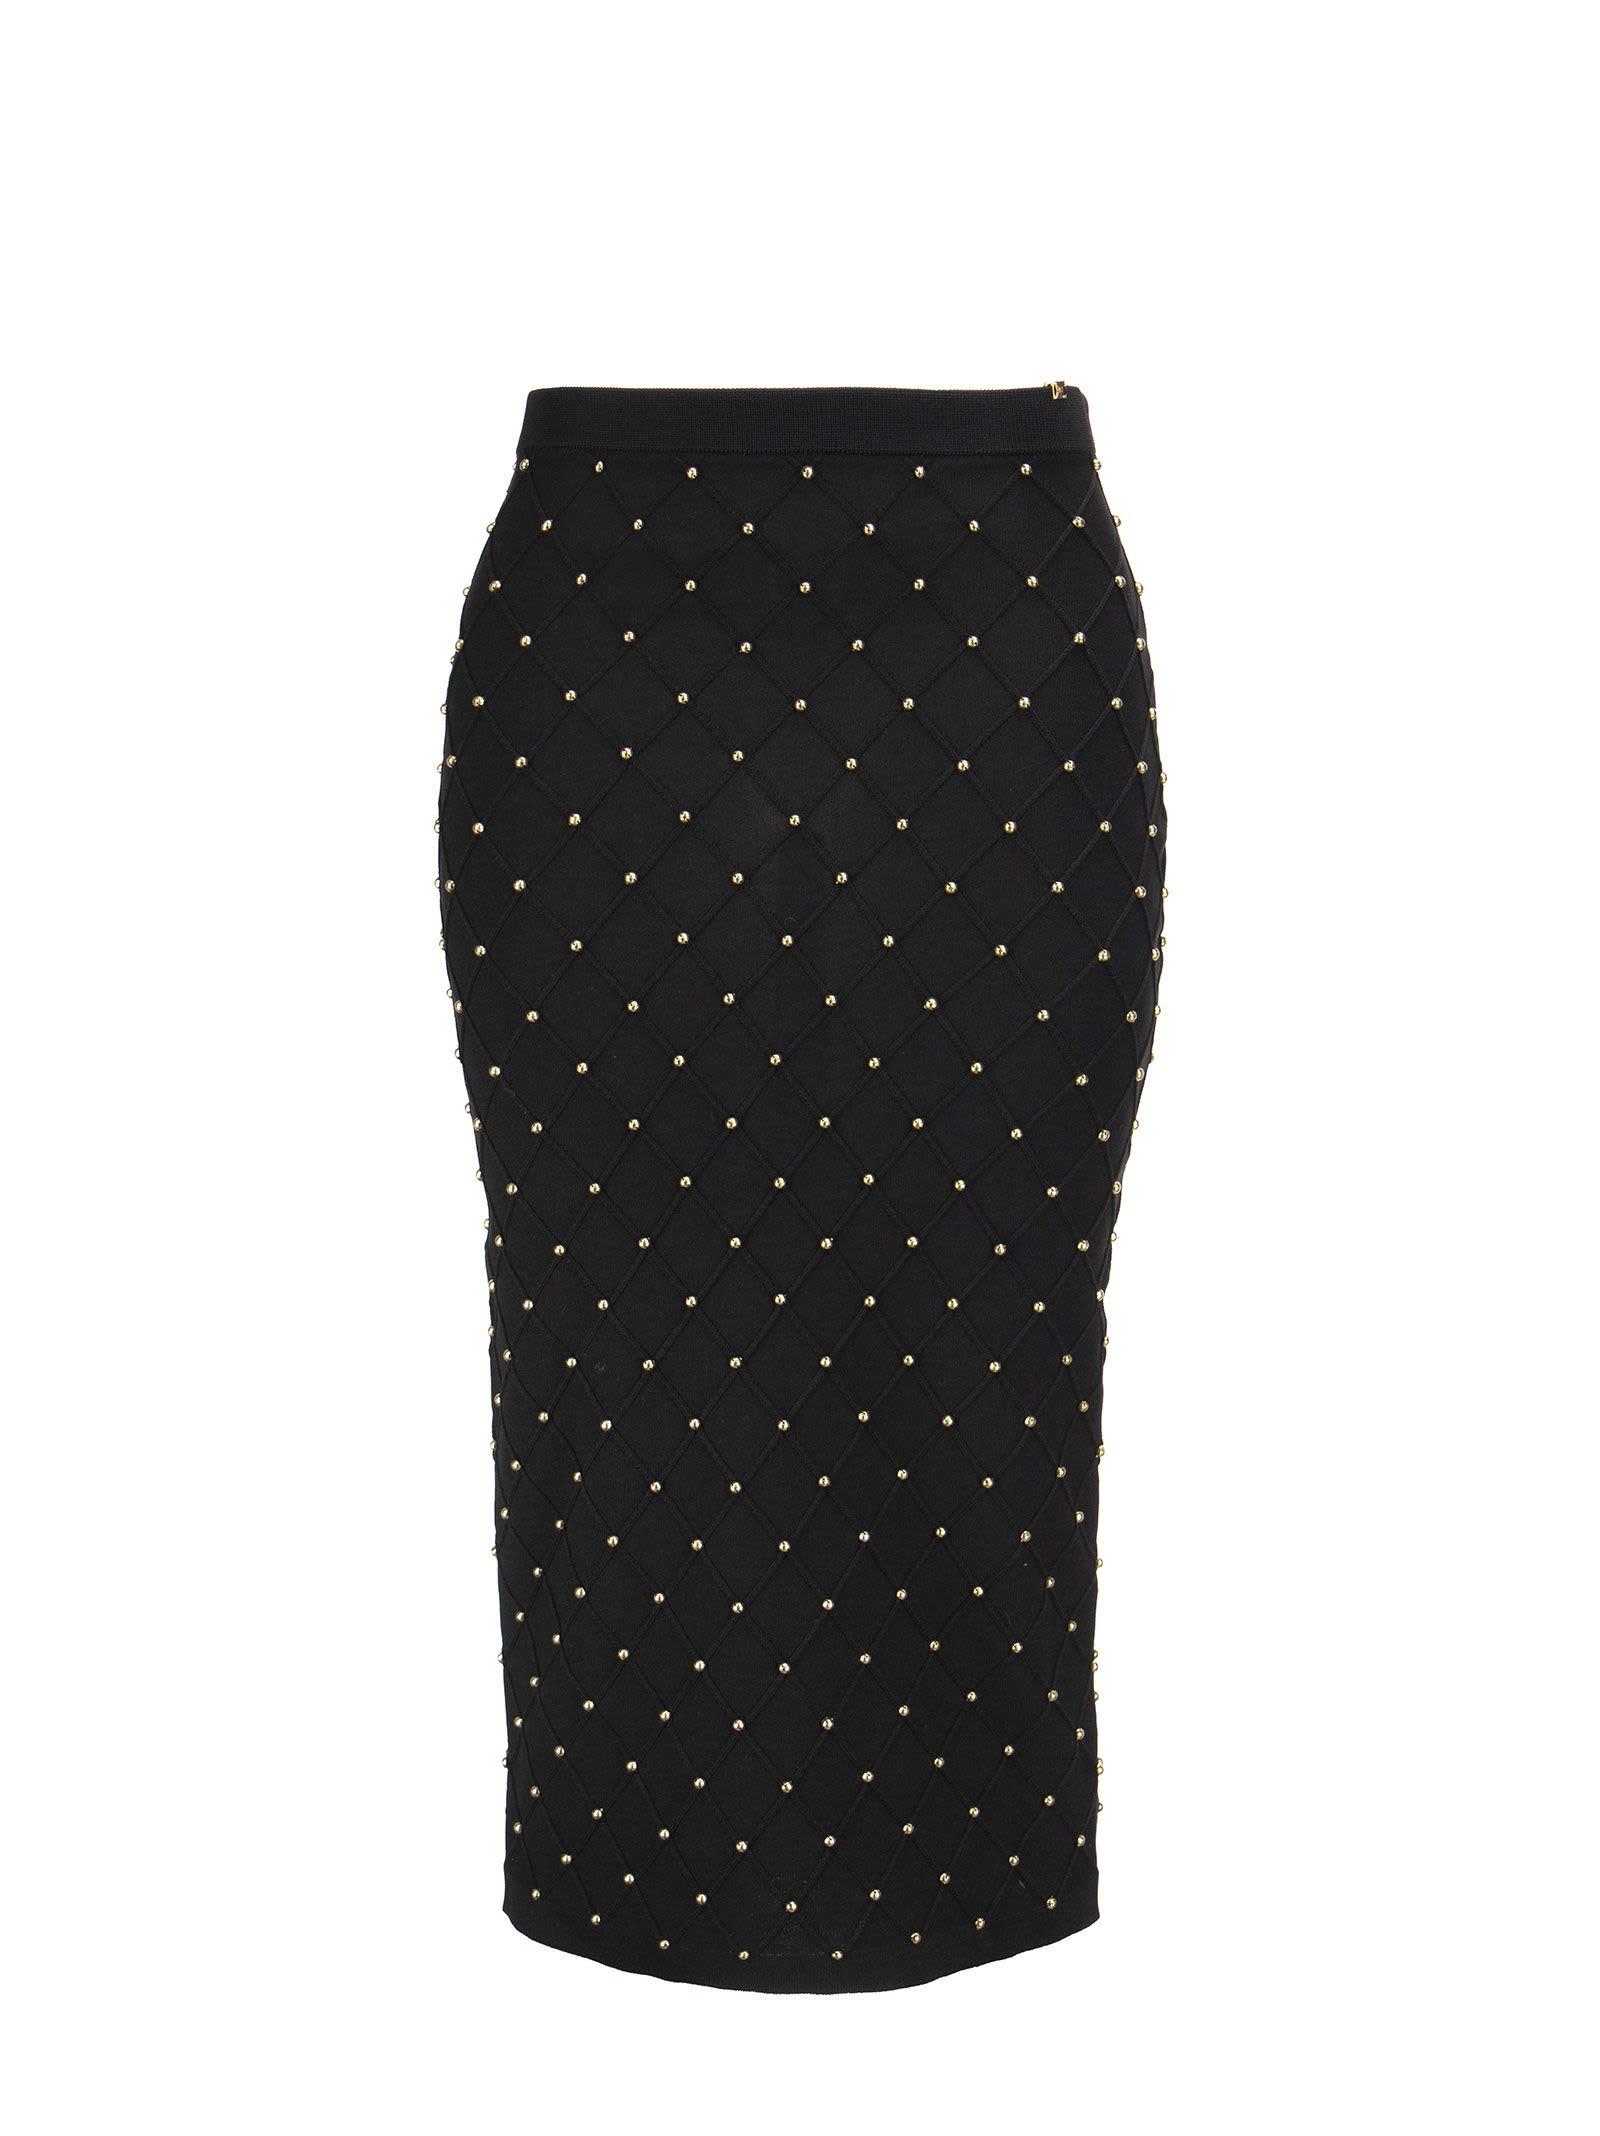 Elisabetta Franchi Knit Calf-length Skirt With Studs